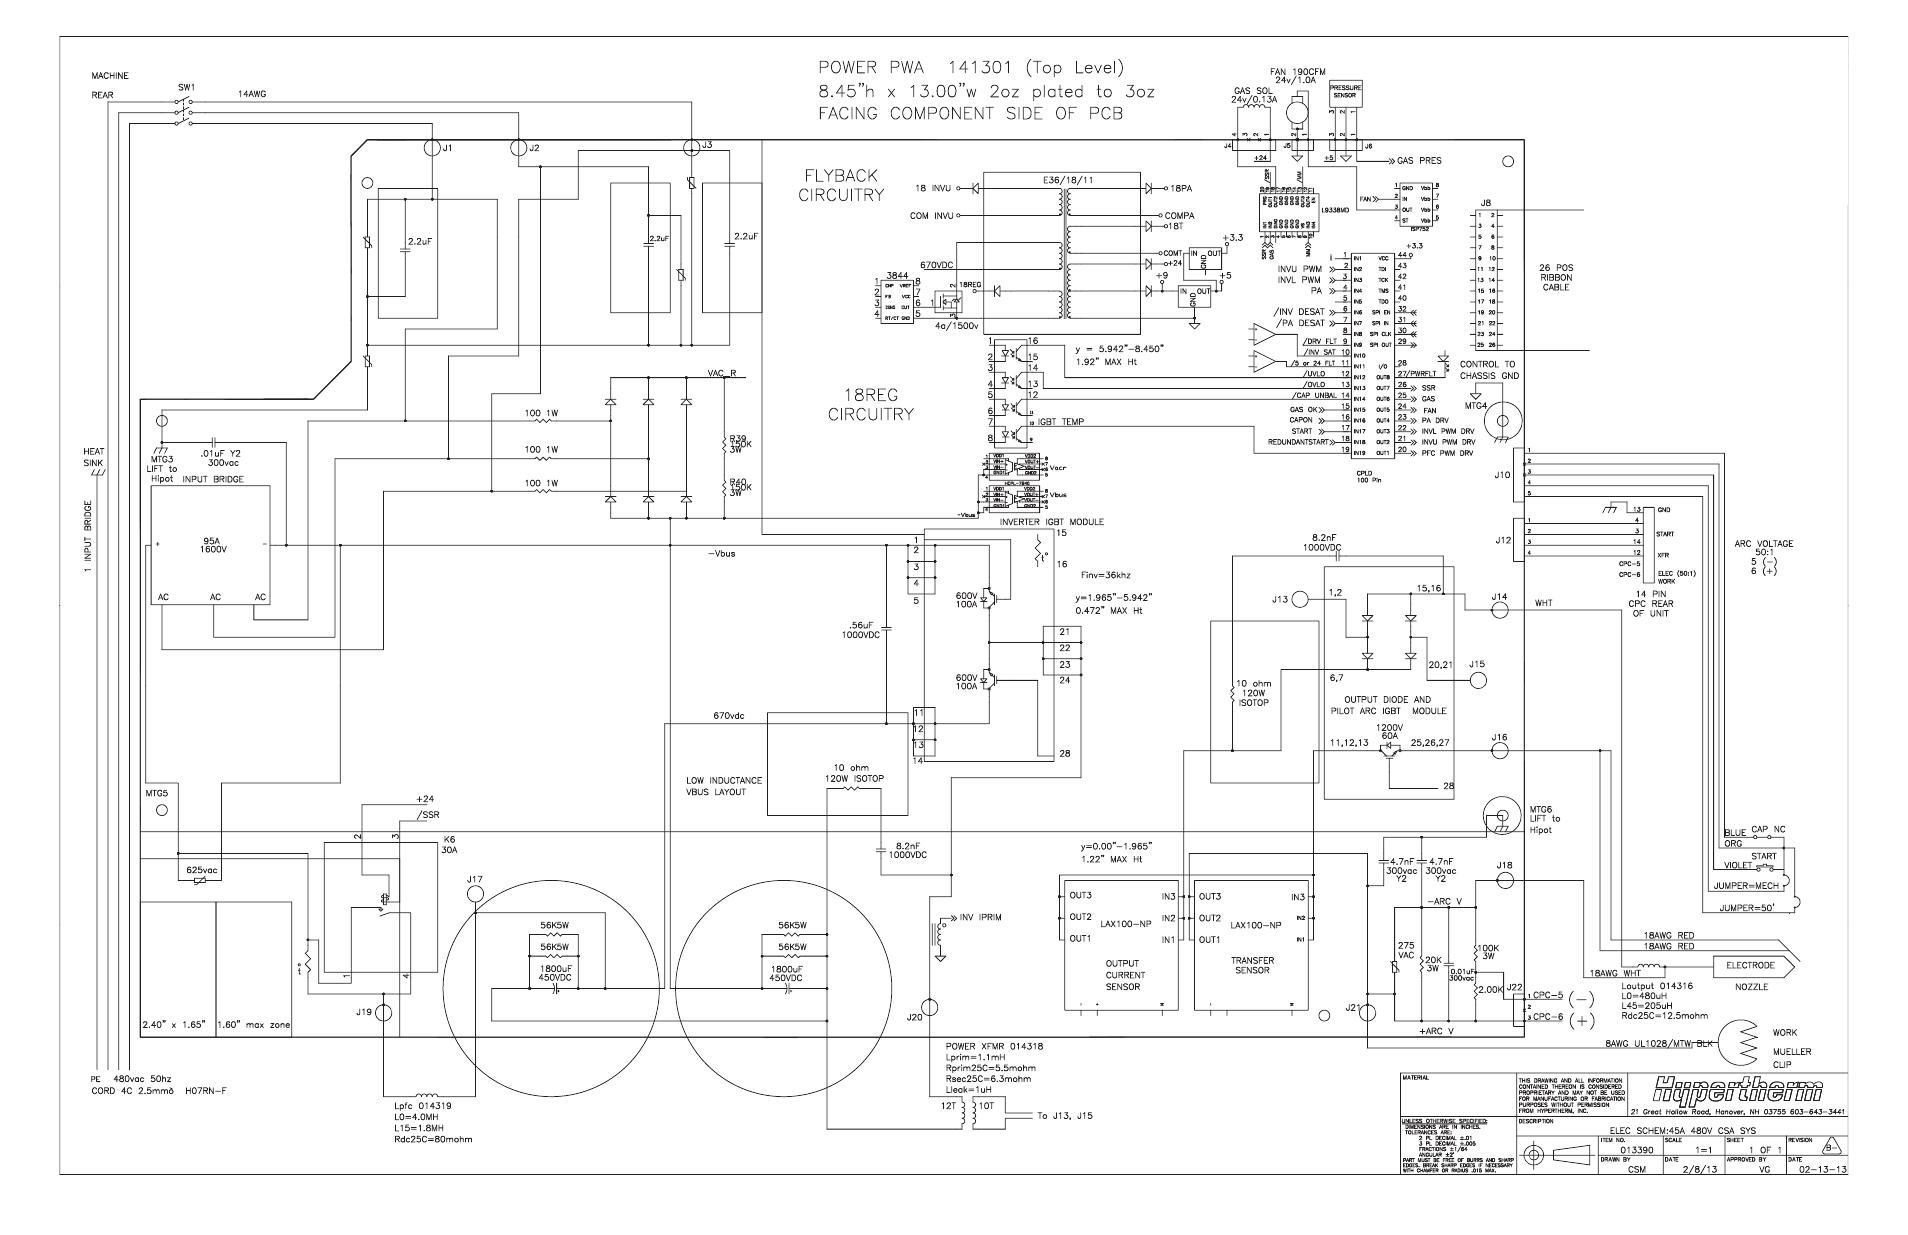 Power Board Wiring Diagram 480 V Csa Power Board Wiring Diagram 480 V Csa 7 Hypertherm Powermax45 Service Manual User Manual Page 149 149